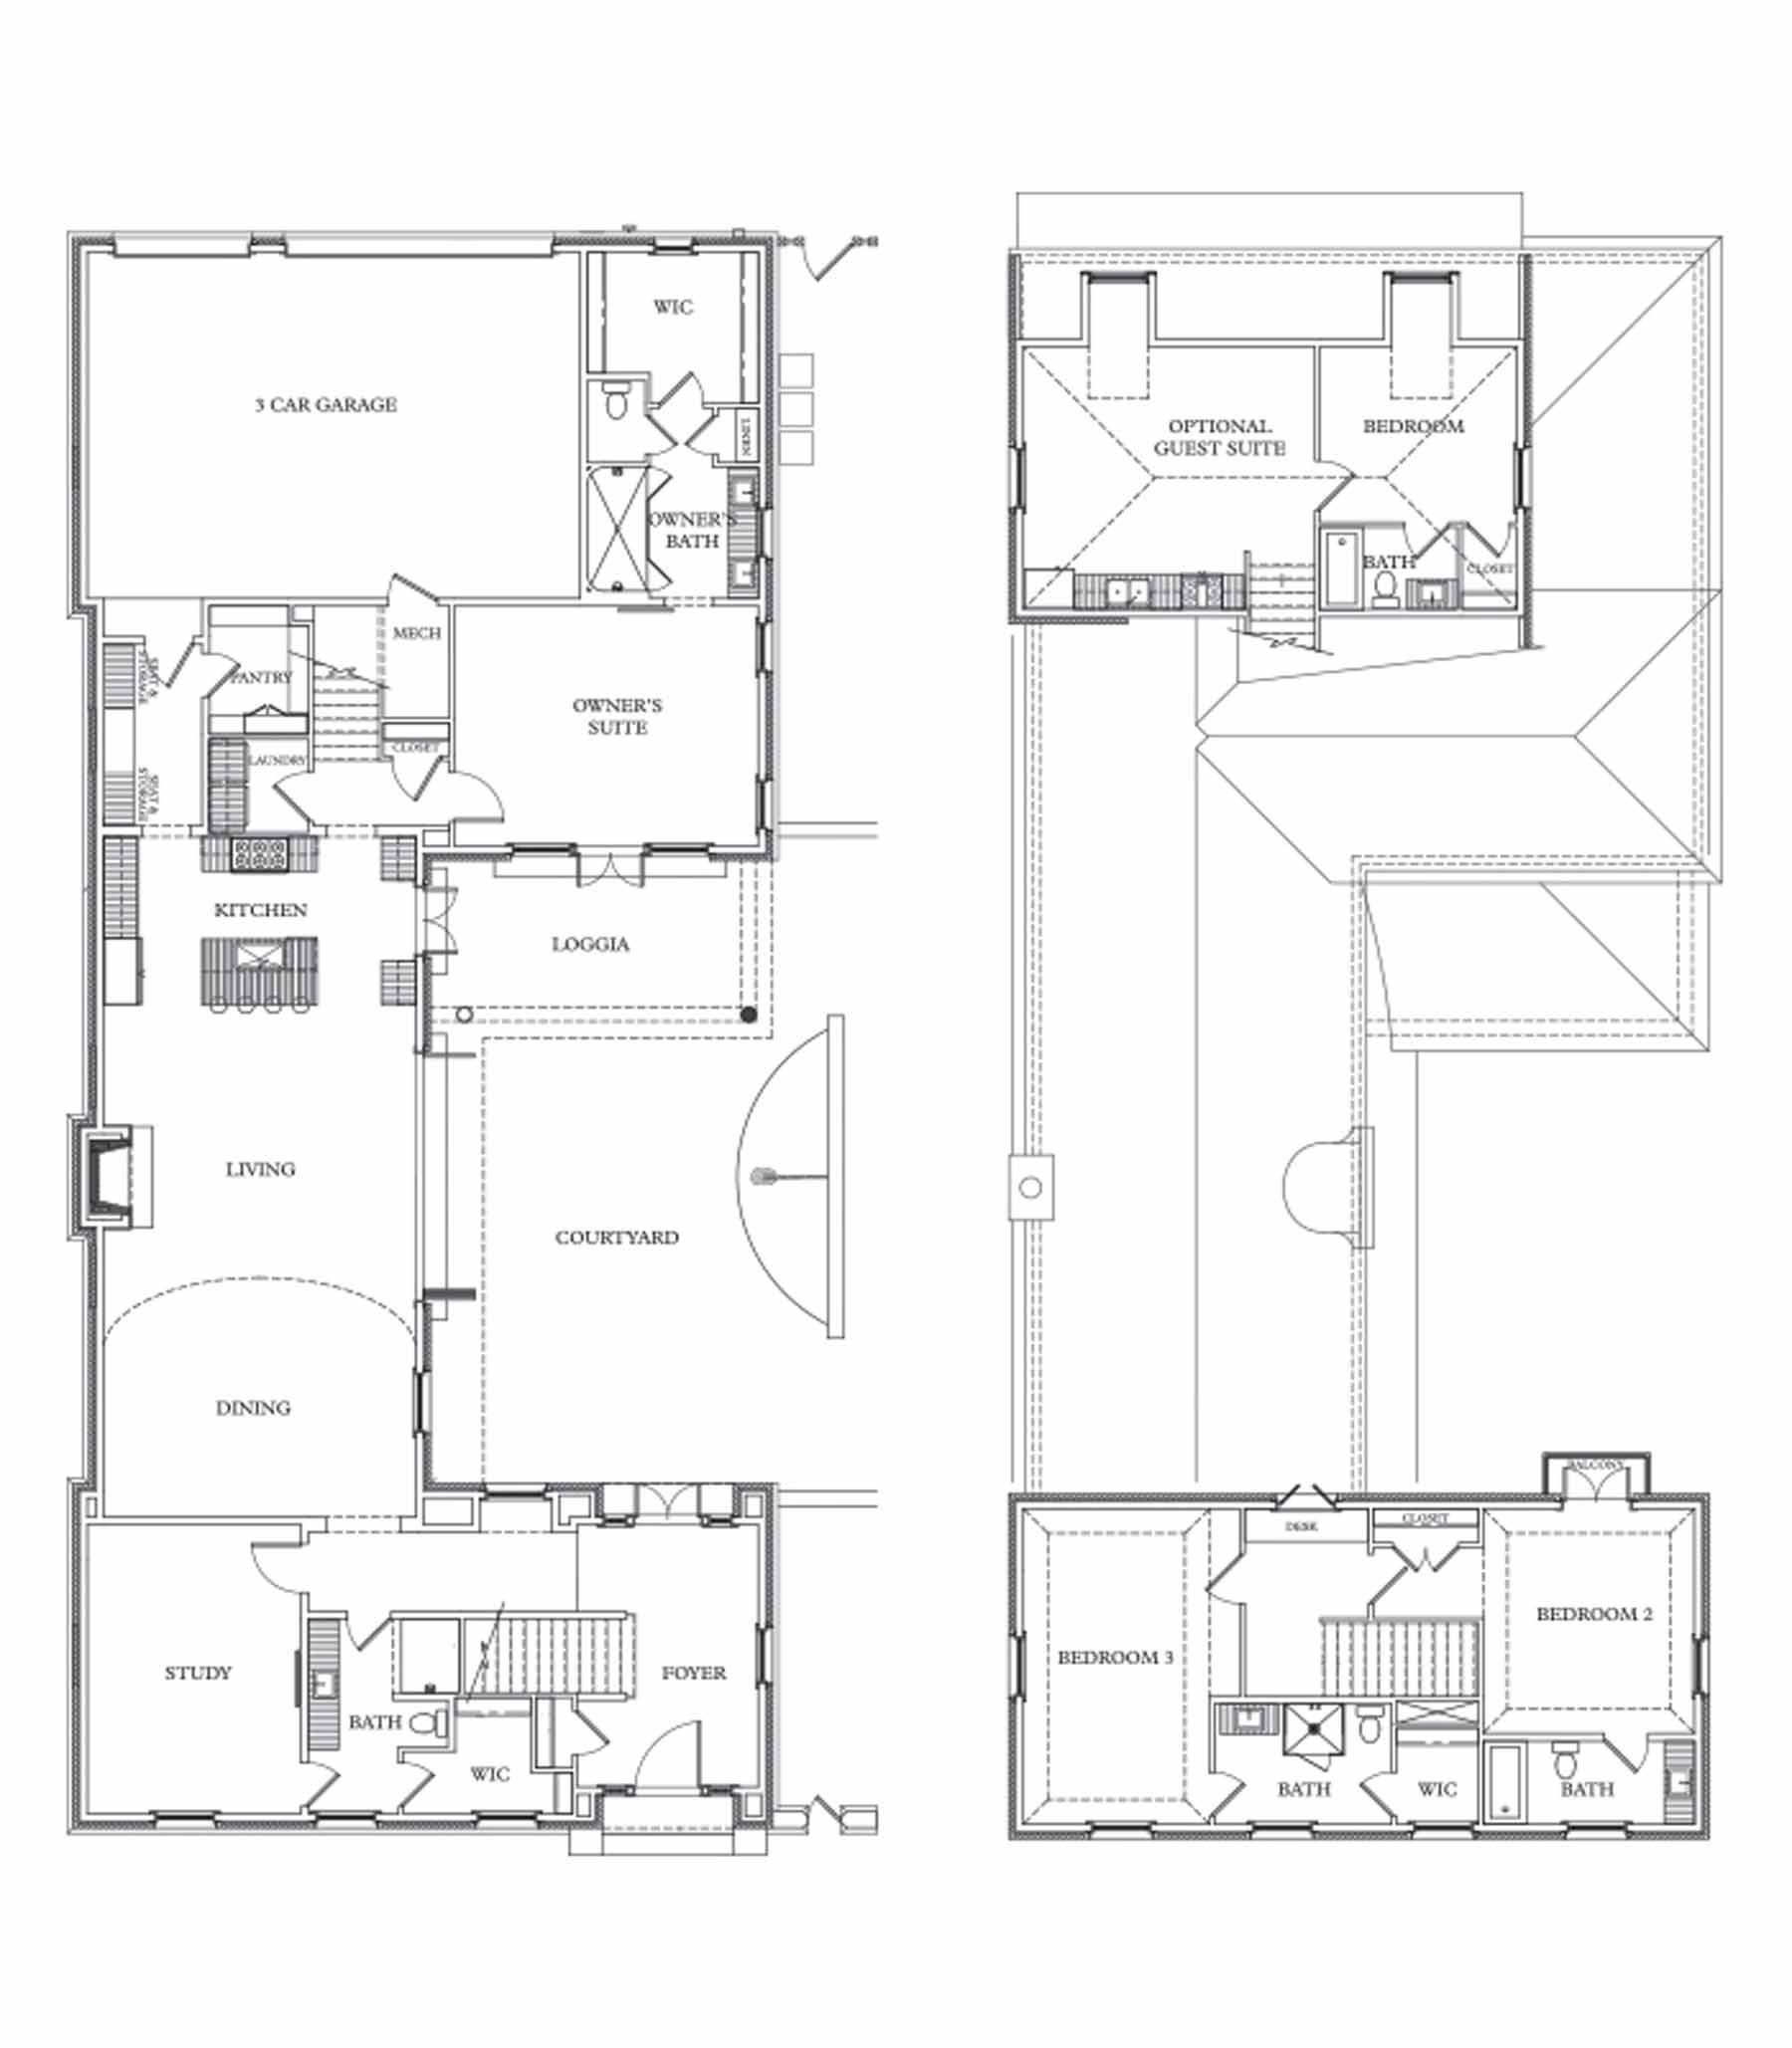 Single Family Home for Sale at Elegant Courtyard Villa Collection at Avalon 346 S Esplanade Alpharetta, Georgia, 30009 United States